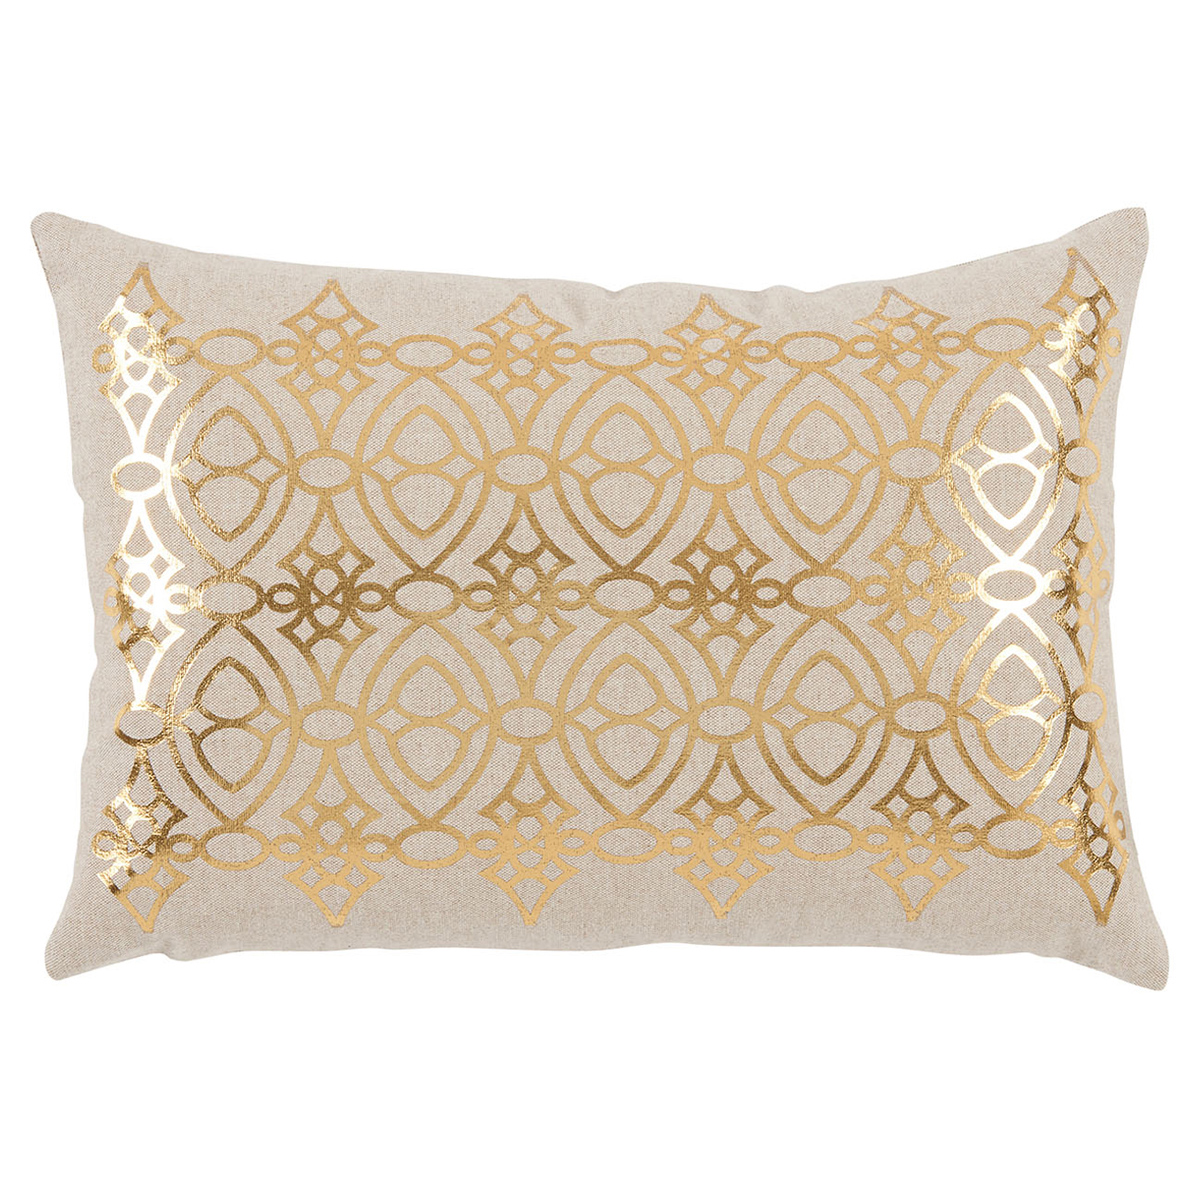 Avril Hollywood Regency Gold Lattice Beige Pillow - 13x19